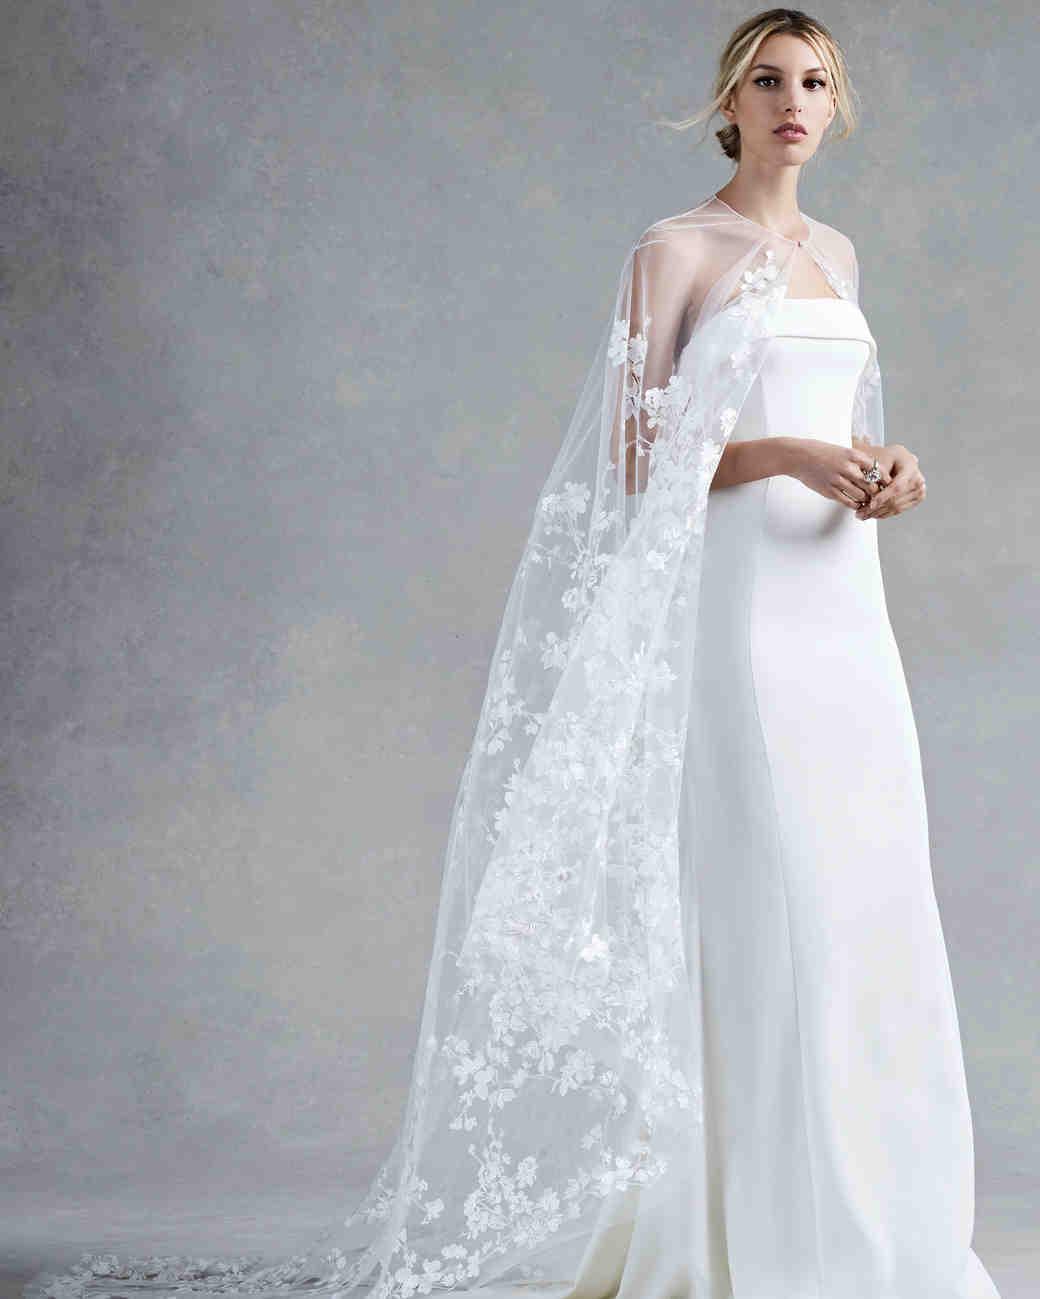 Vows Wedding Dresses 95 Best Oscar de la Renta